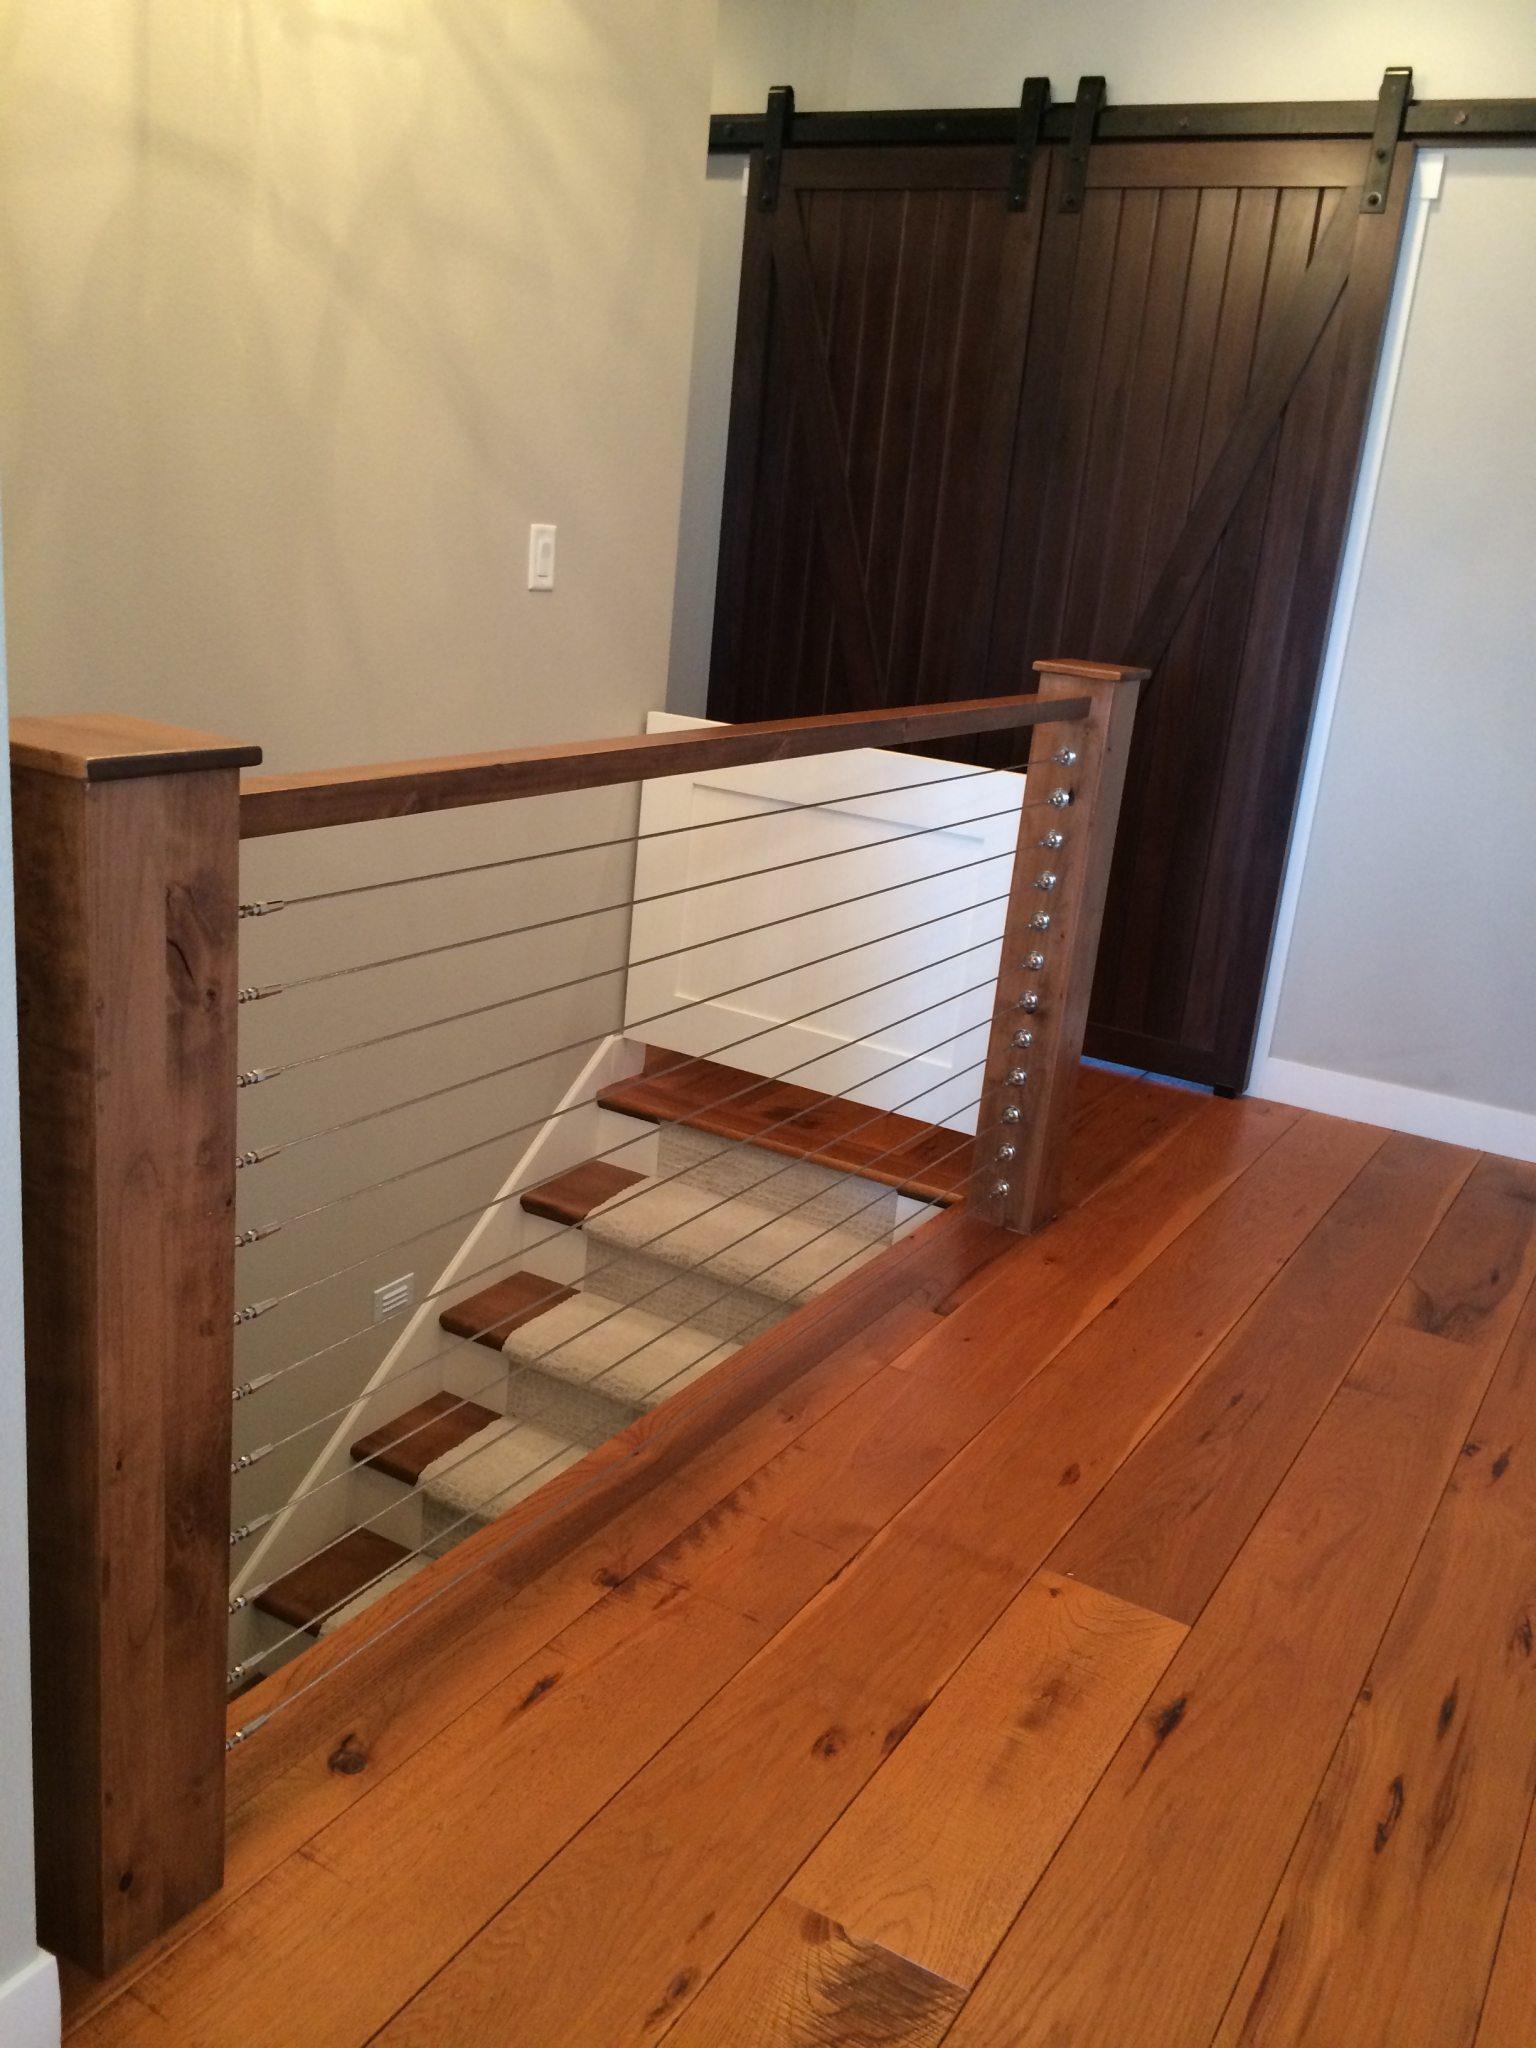 Distressed Wood Flooring in a Modern Farmhouse on Carlisle Wide Plank Floors Blog